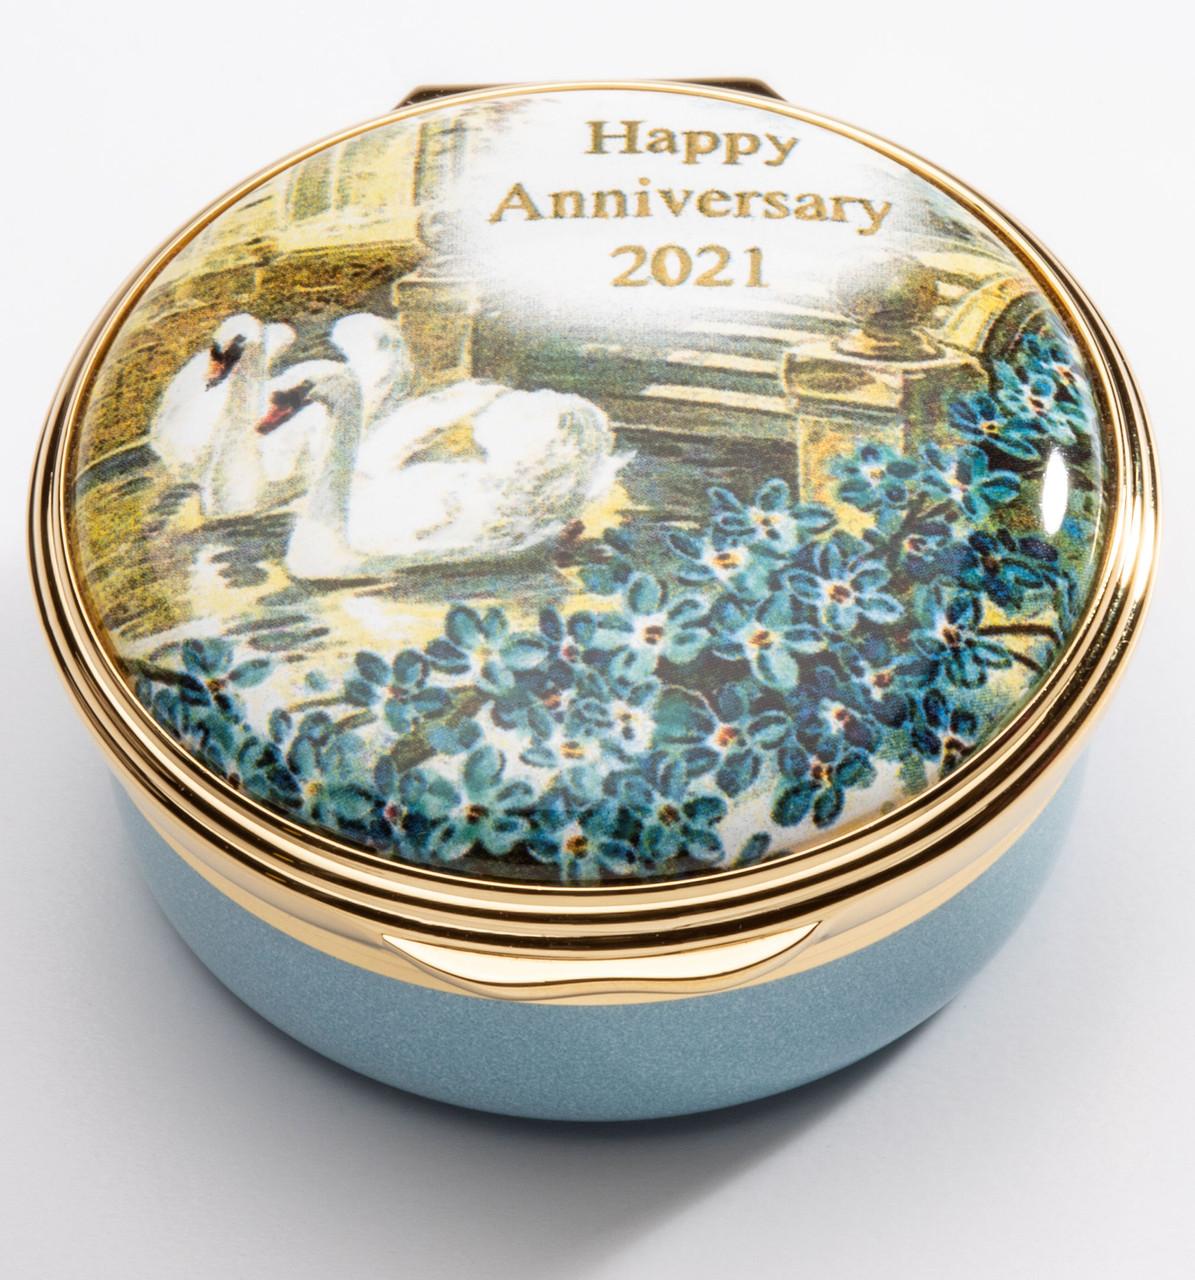 alcyon Days 2021 Happy Anniversary Box ENHA211001G